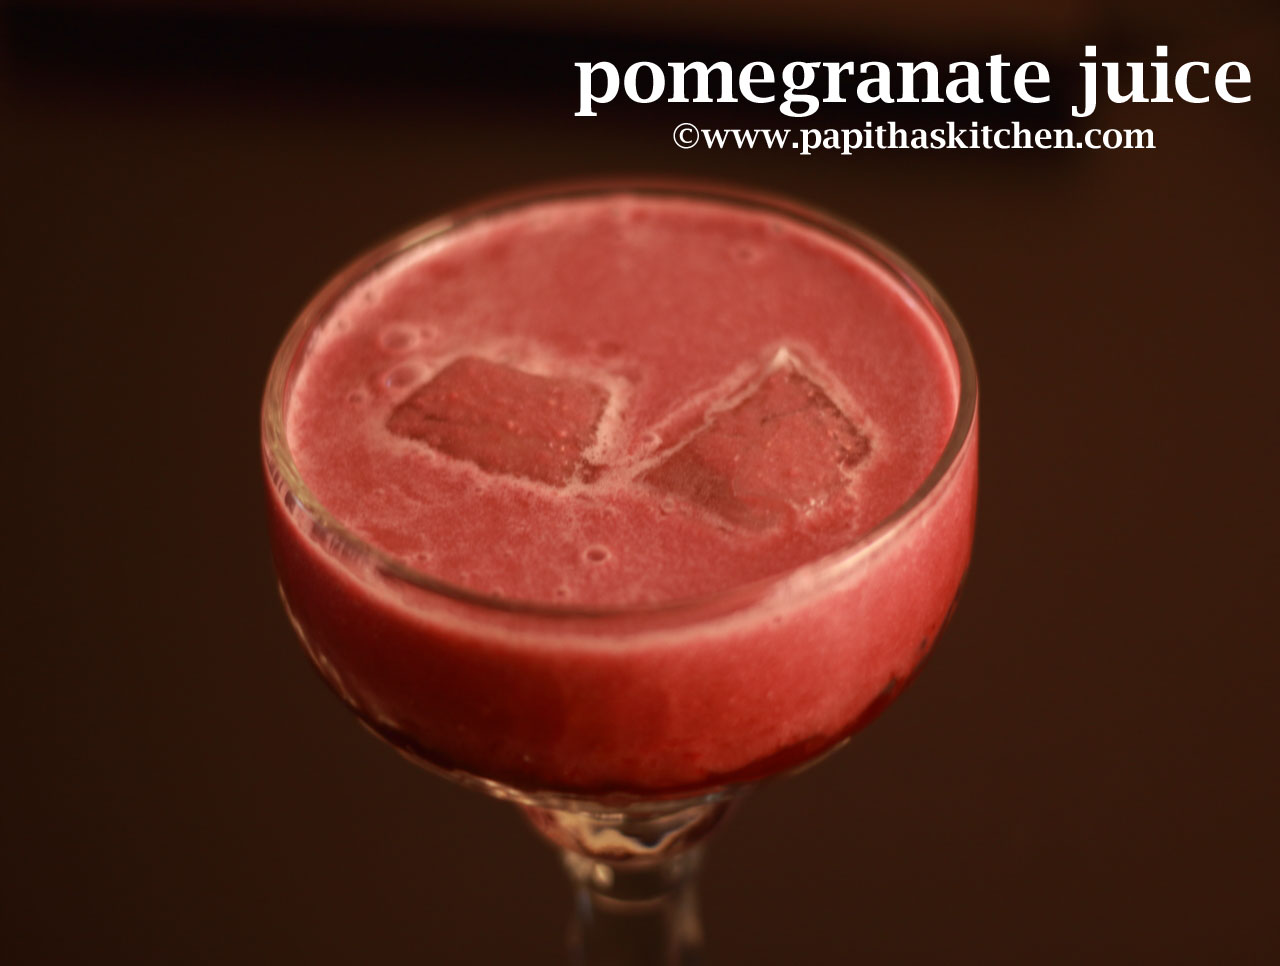 pomegranatejuice